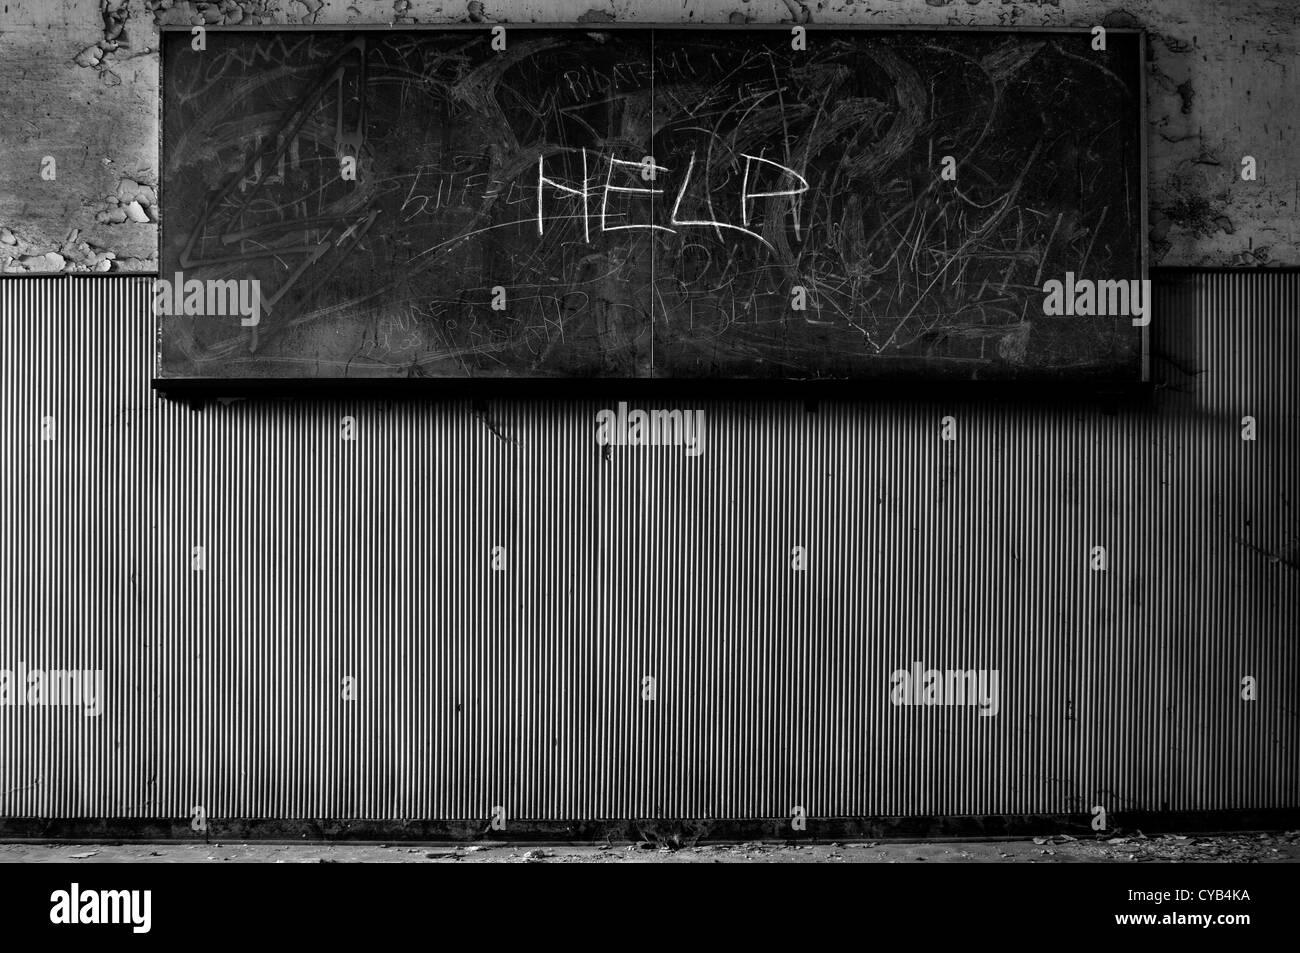 Italien. Zerstörte Tafel in verlassenen Schule Stockbild